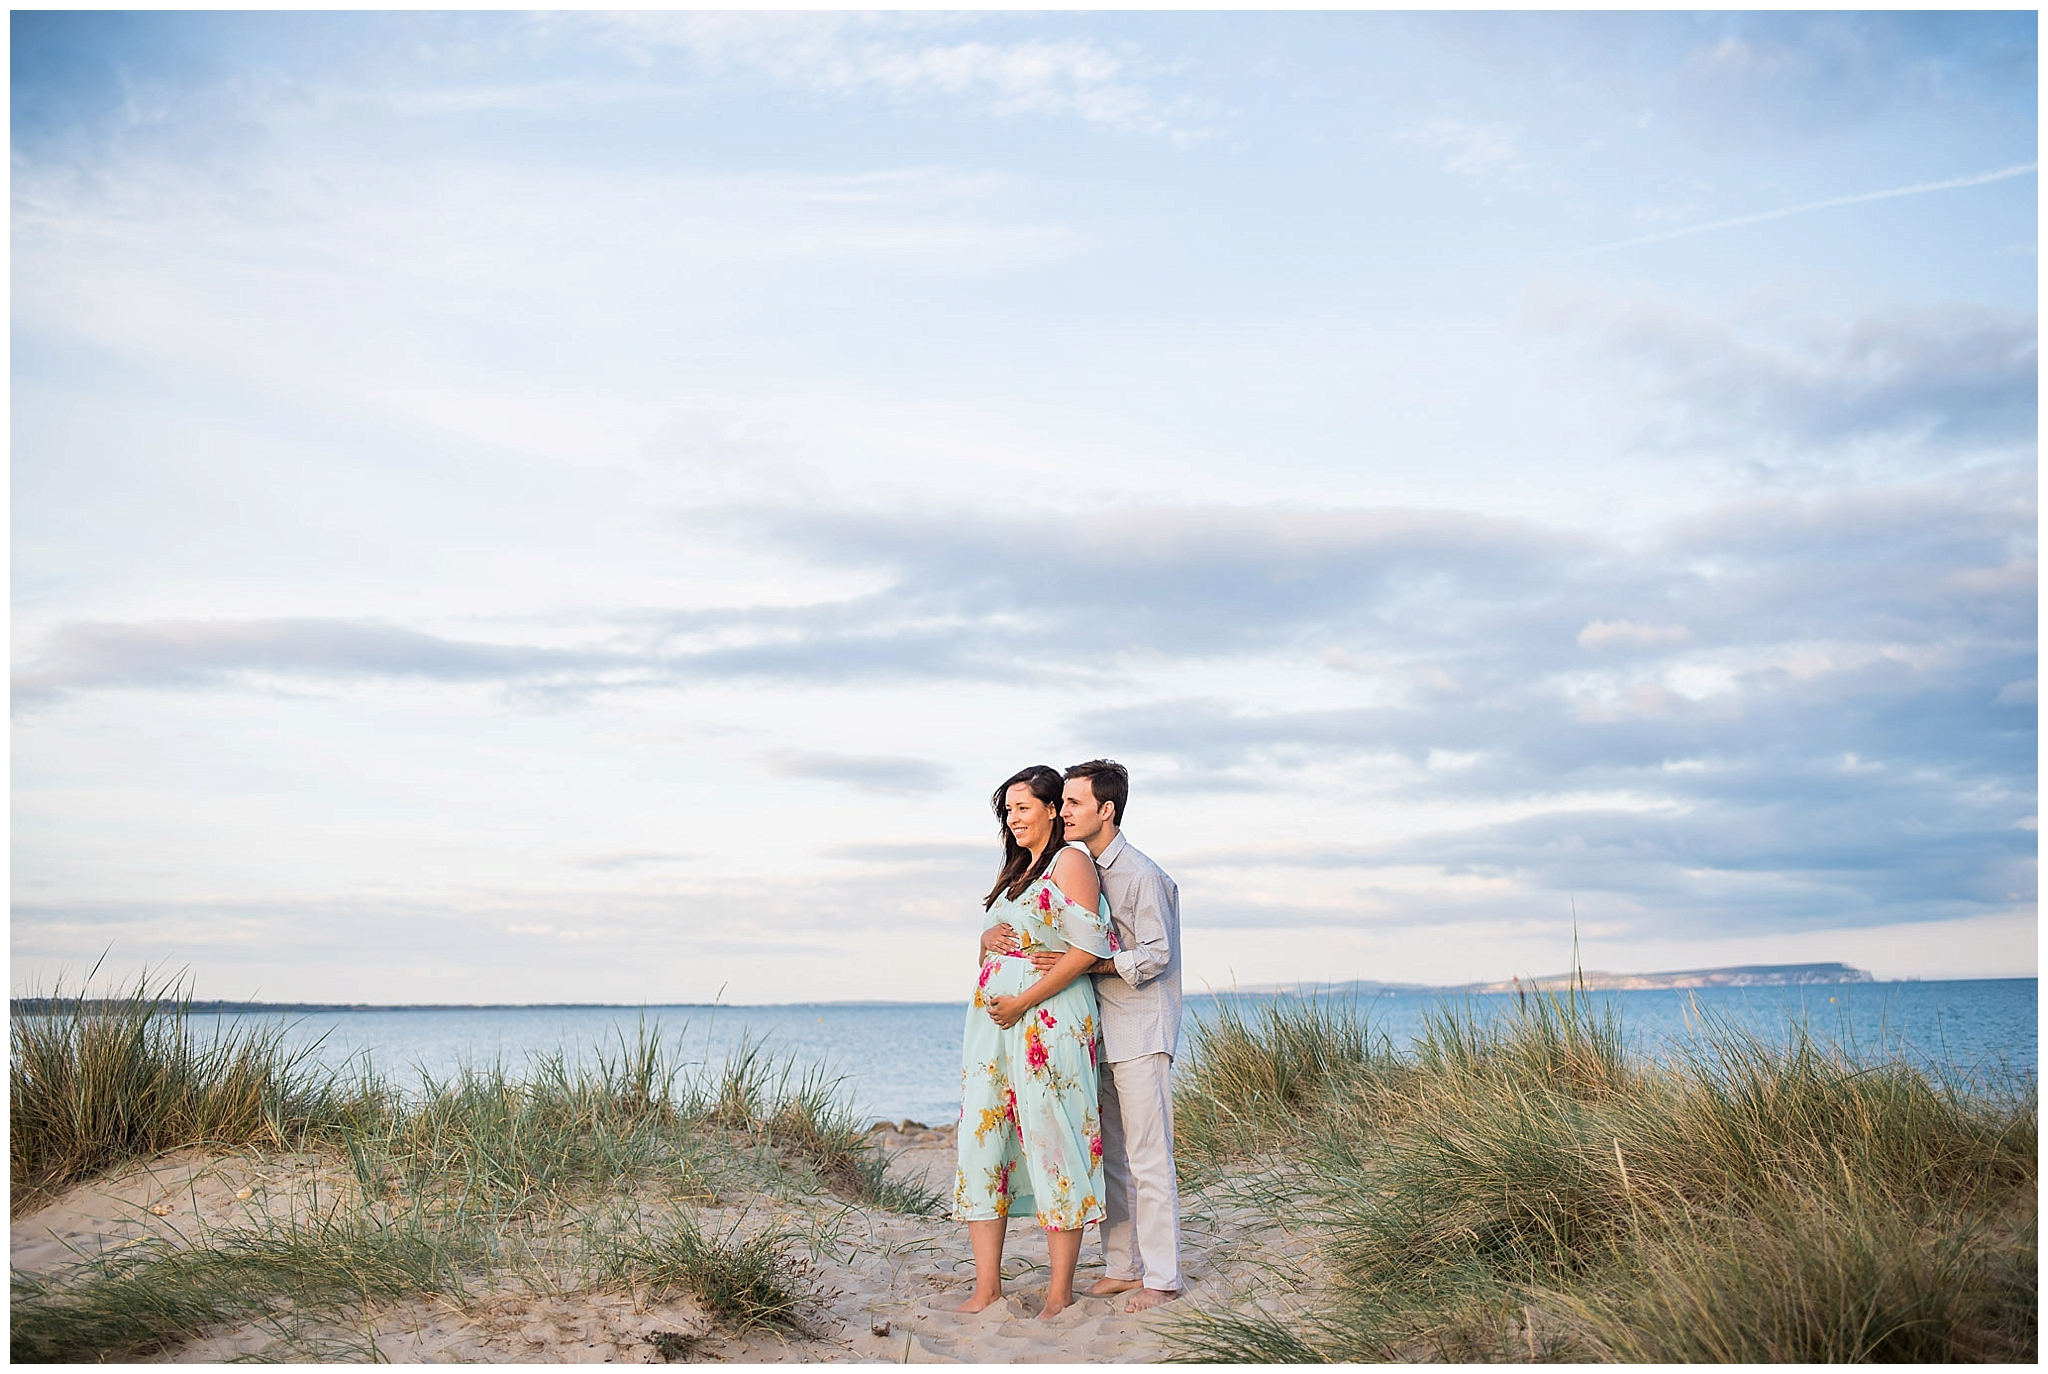 Couple stood in sand dunes seaside maternity shoot